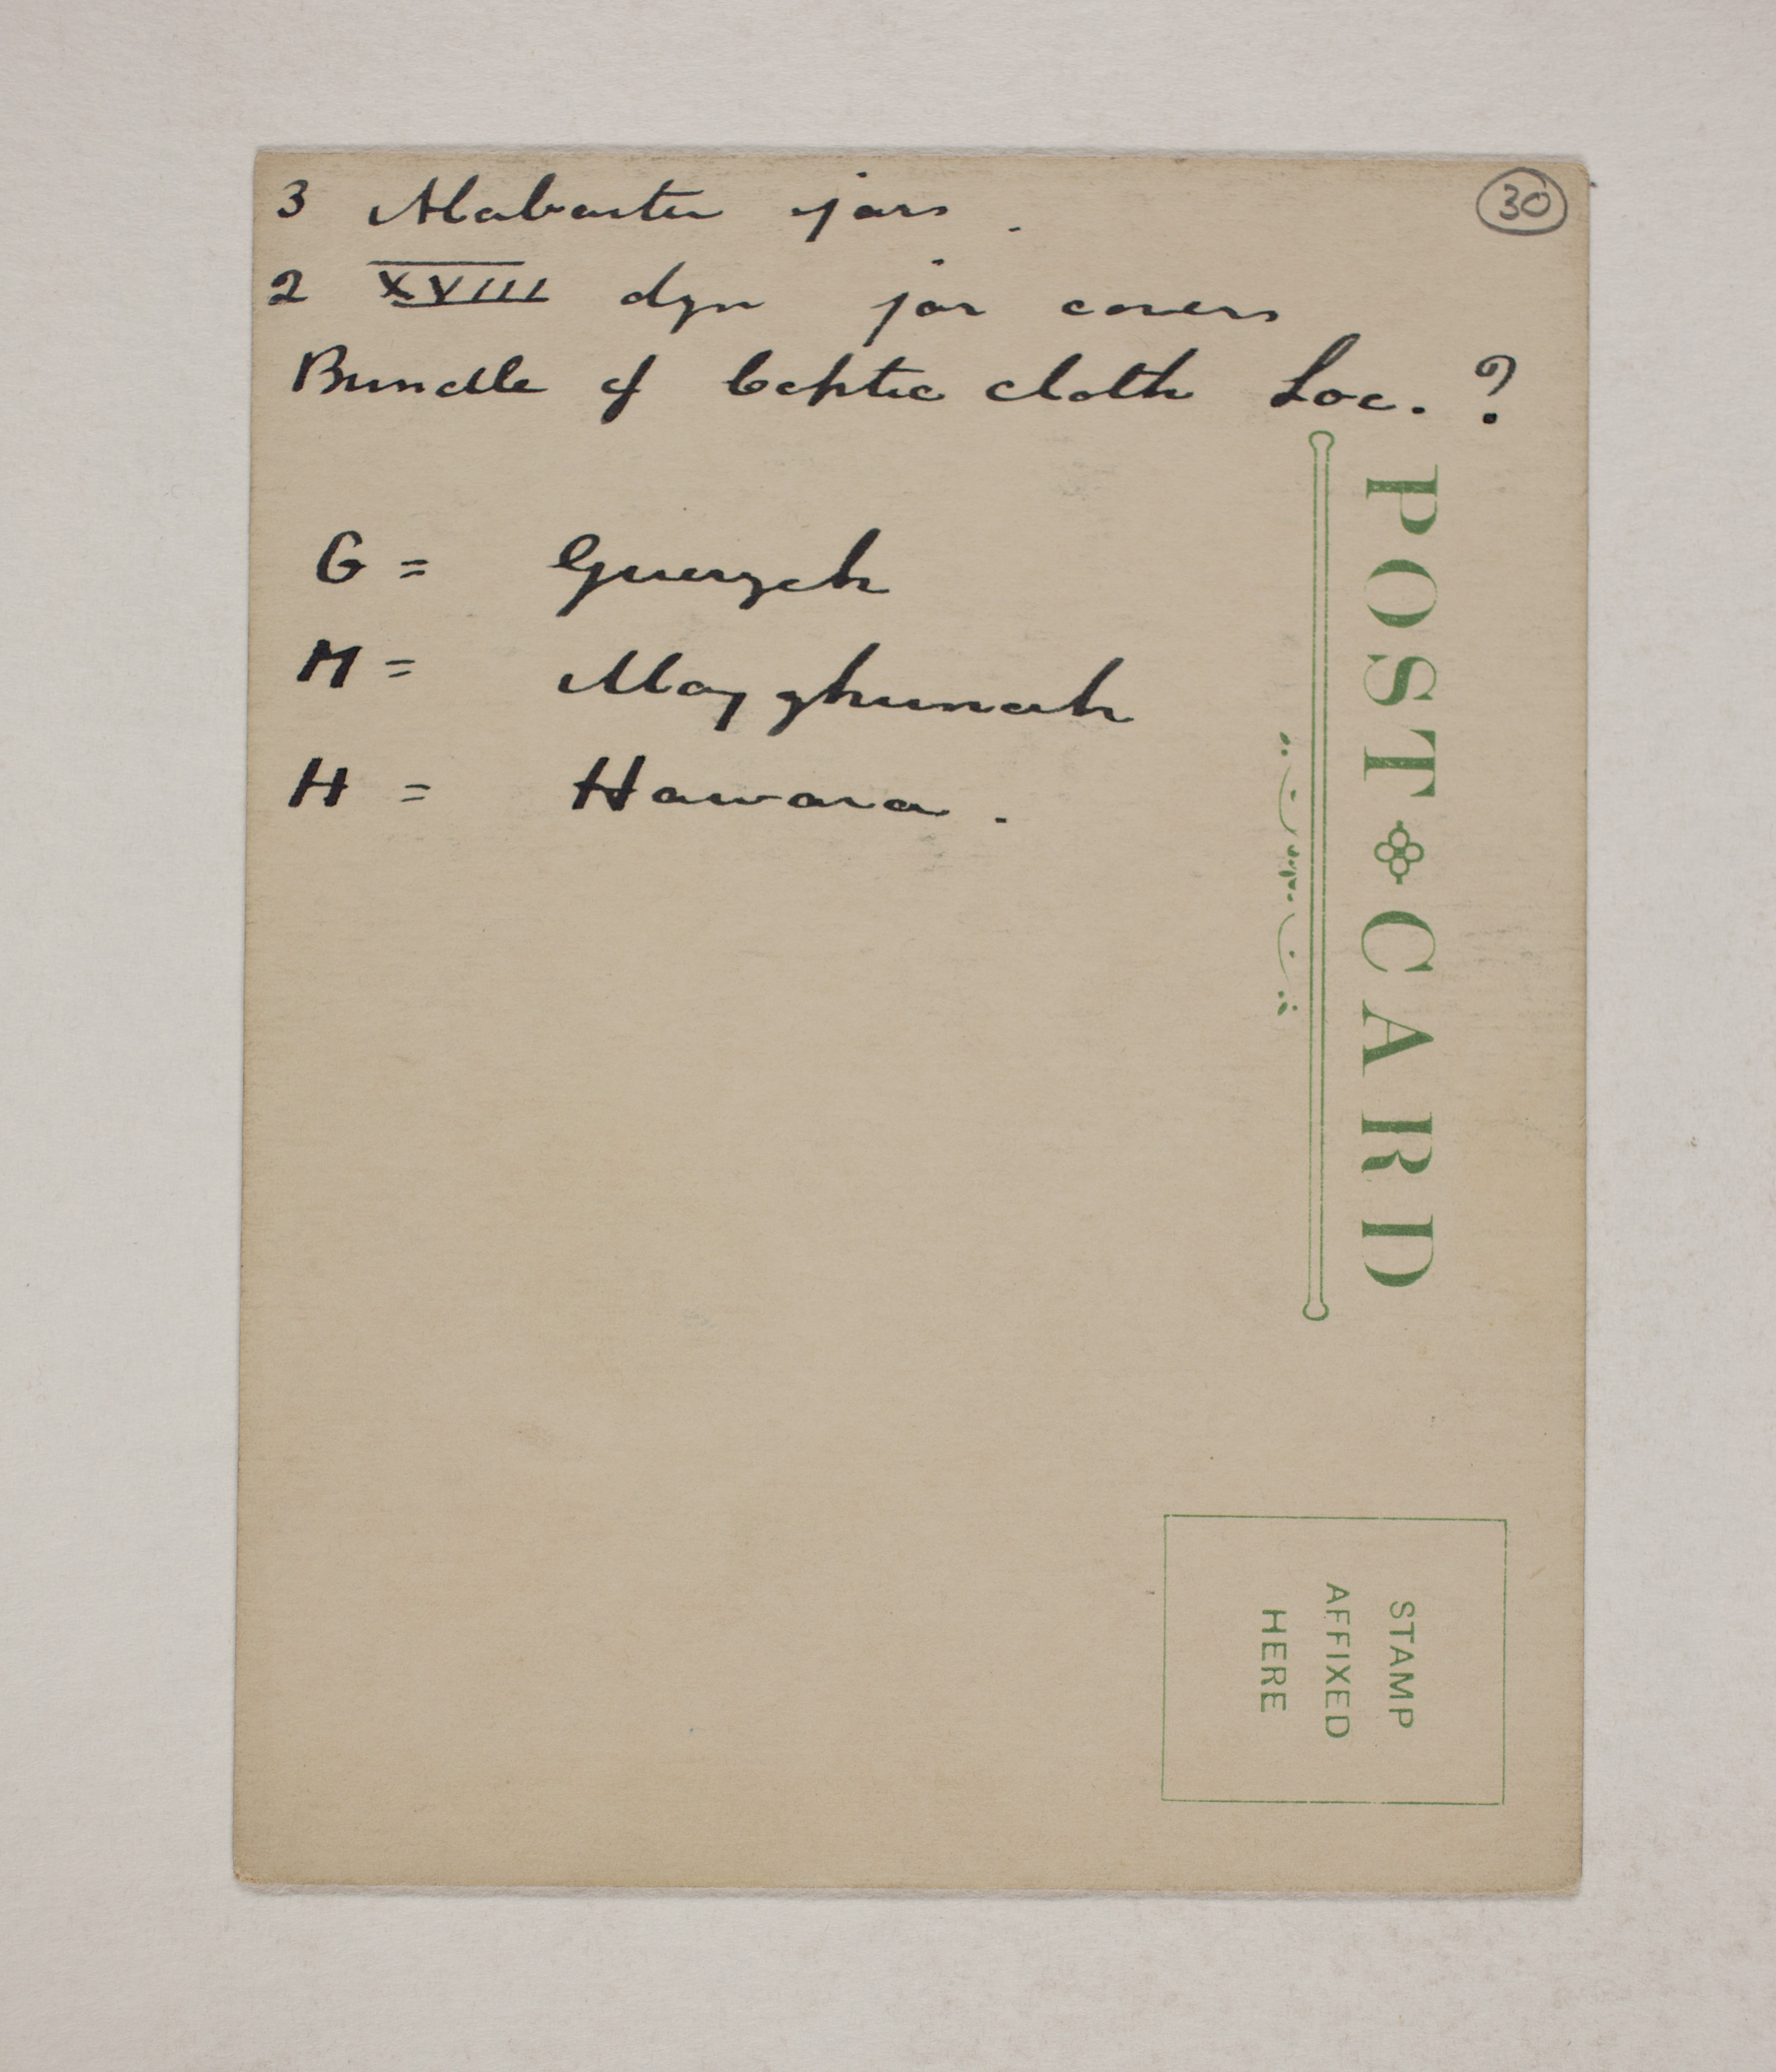 1910-11 Hawara, Gerzeh, Memphis, Mazghuneh Individual institution list  PMA/WFP1/D/19/30.2